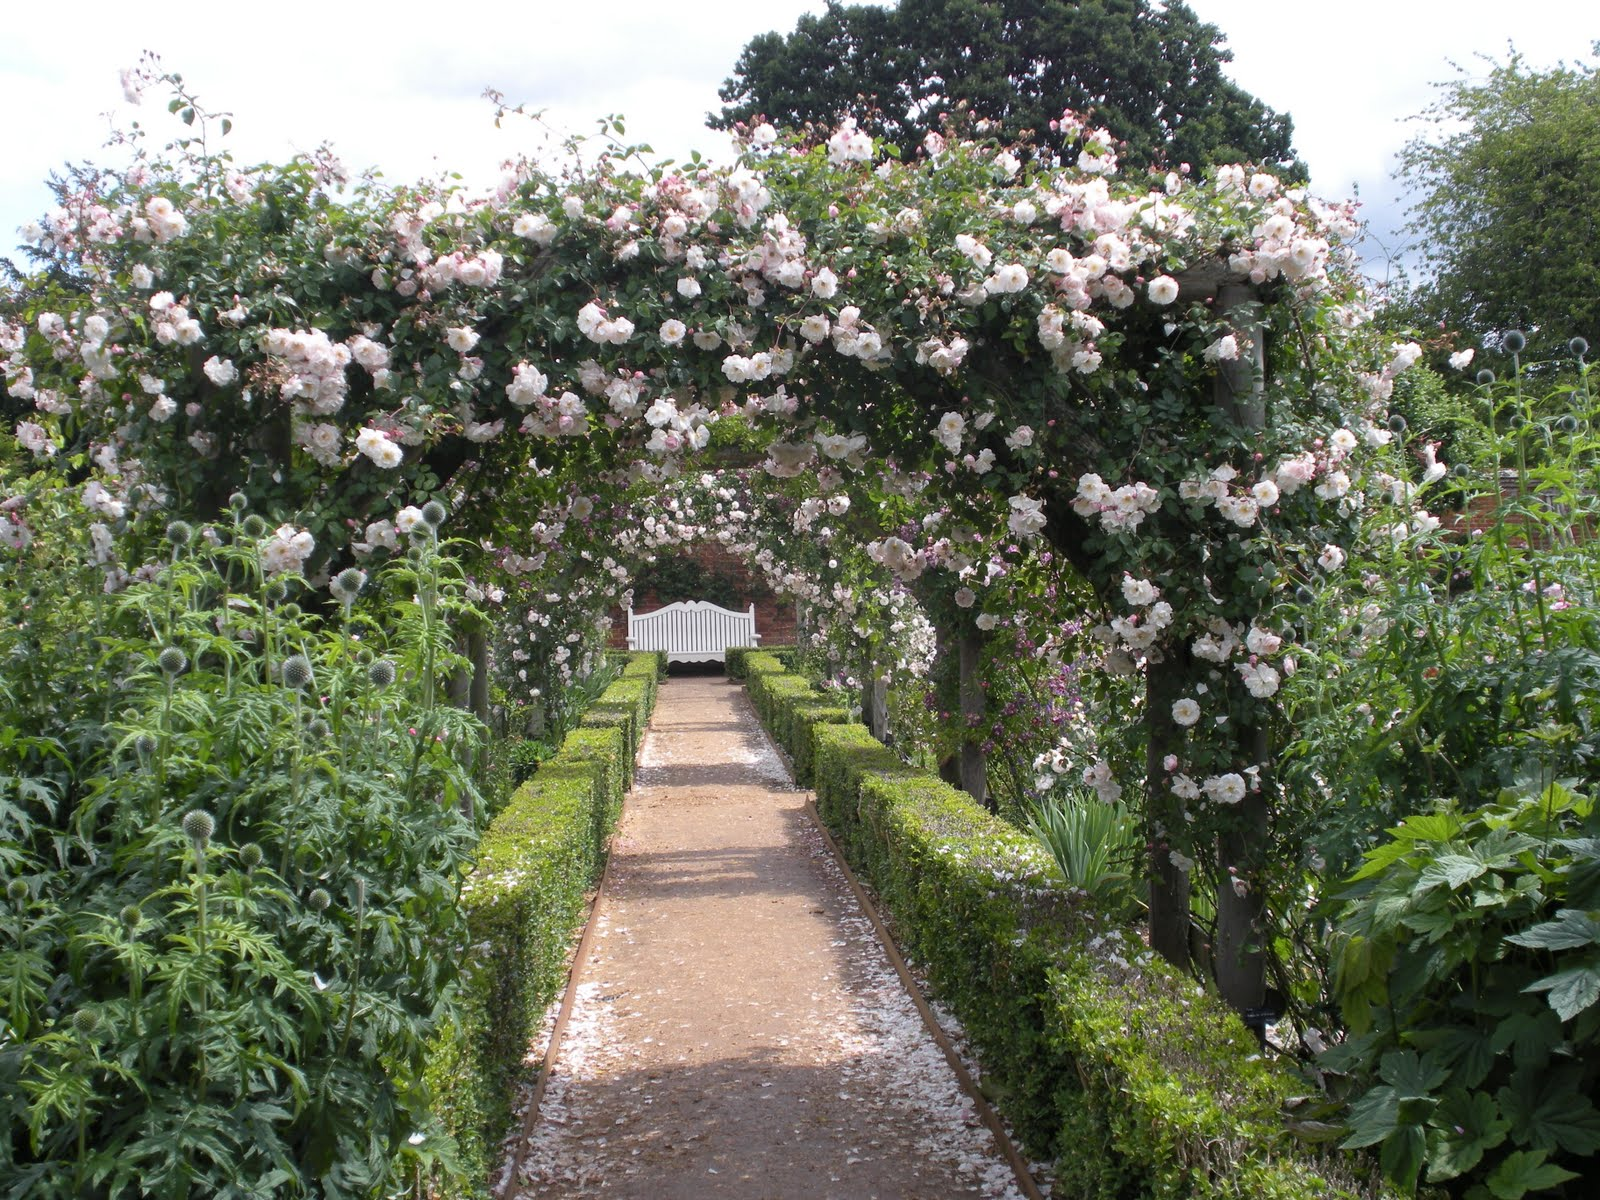 Victoria39s backyard the rose gardens at mottisfont abbey for Backyard rose garden